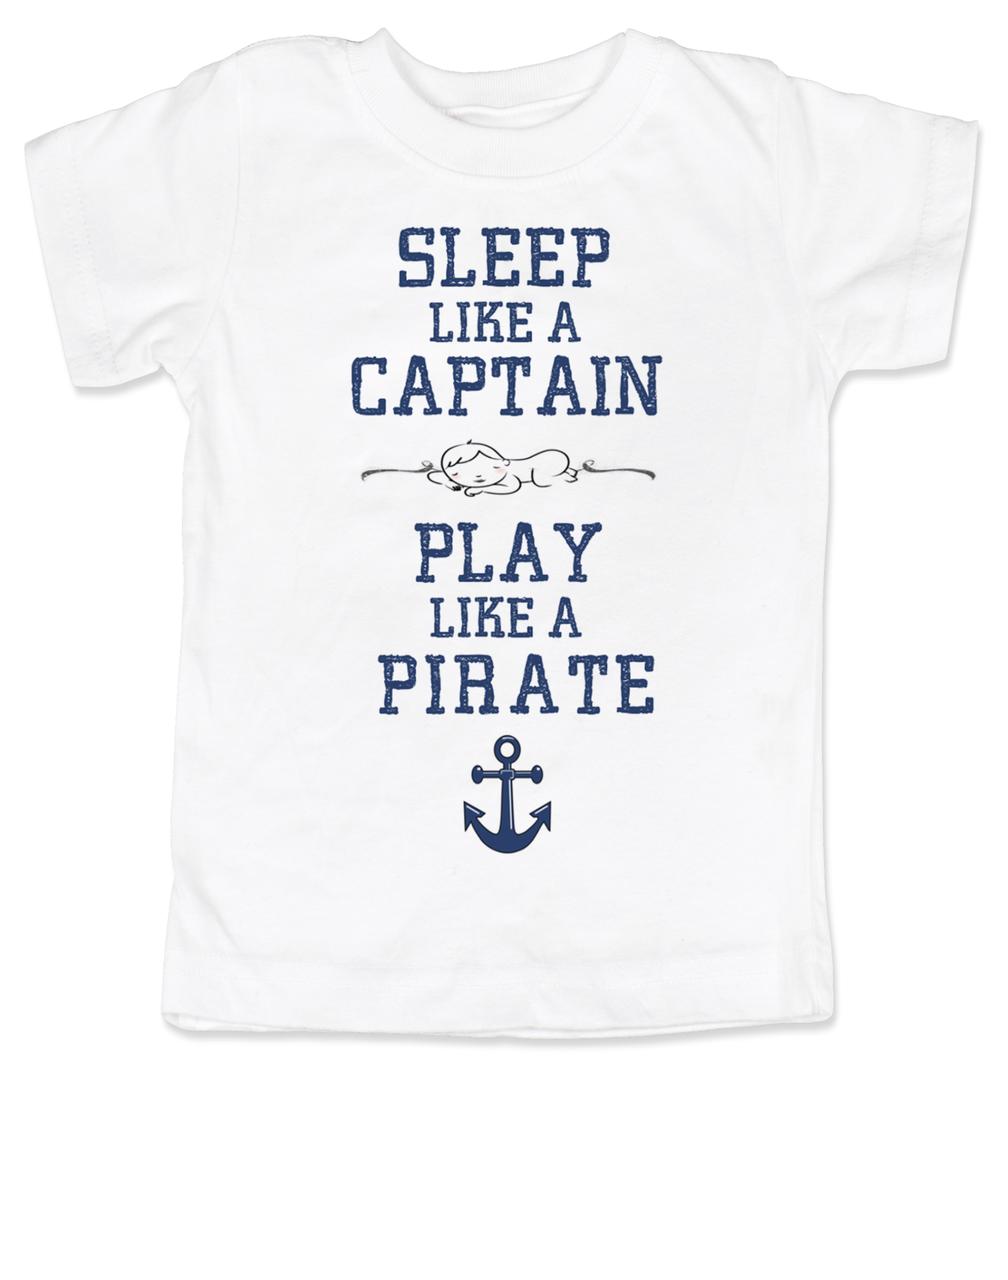 6c89223be Sleep Like A Captain, Play Like a Pirate, wipe me booty, Aaaaar toddler